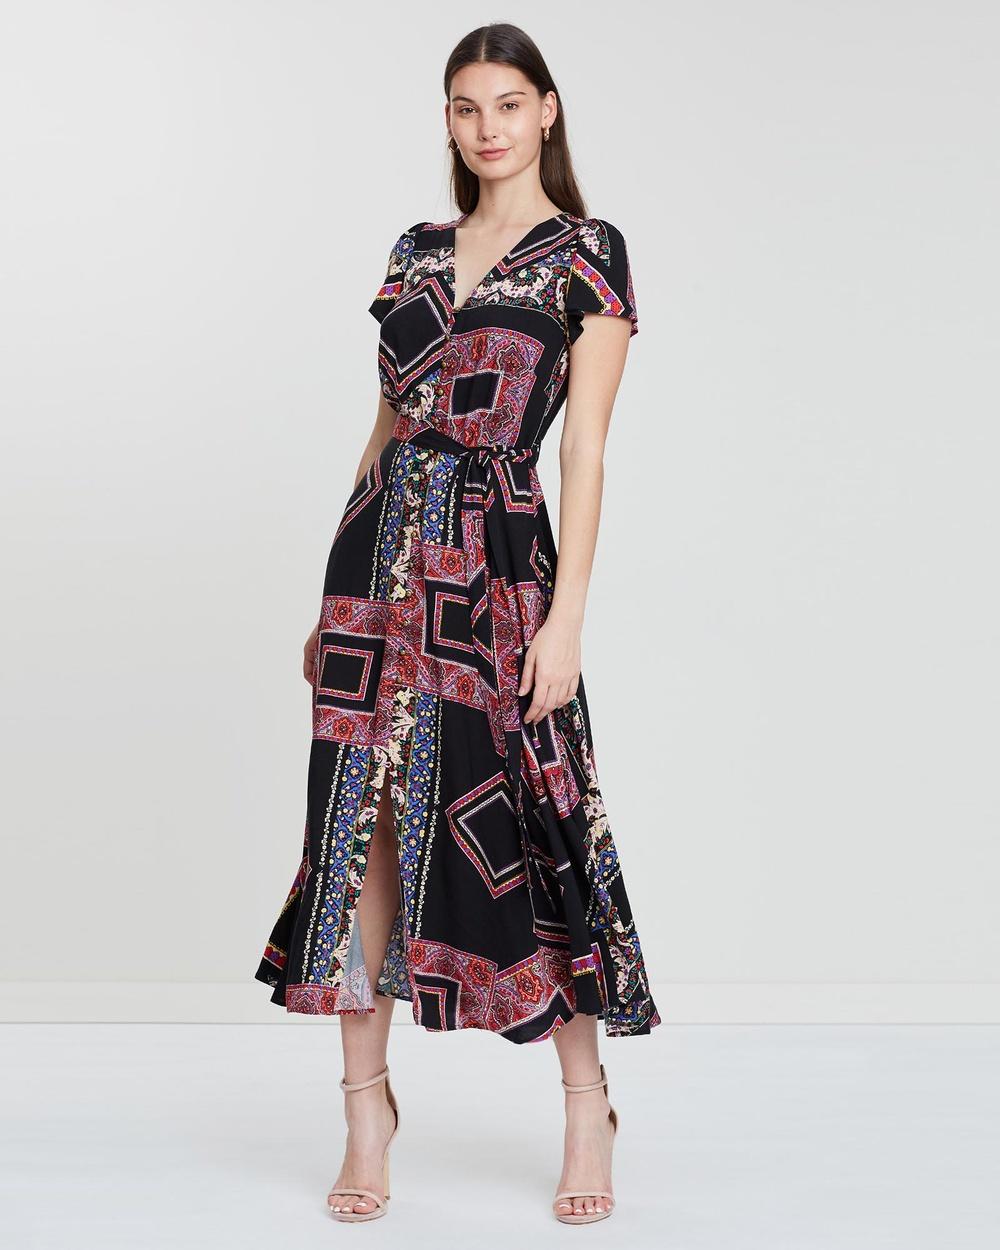 Leona Edmiston Dress-Up-Box Mira